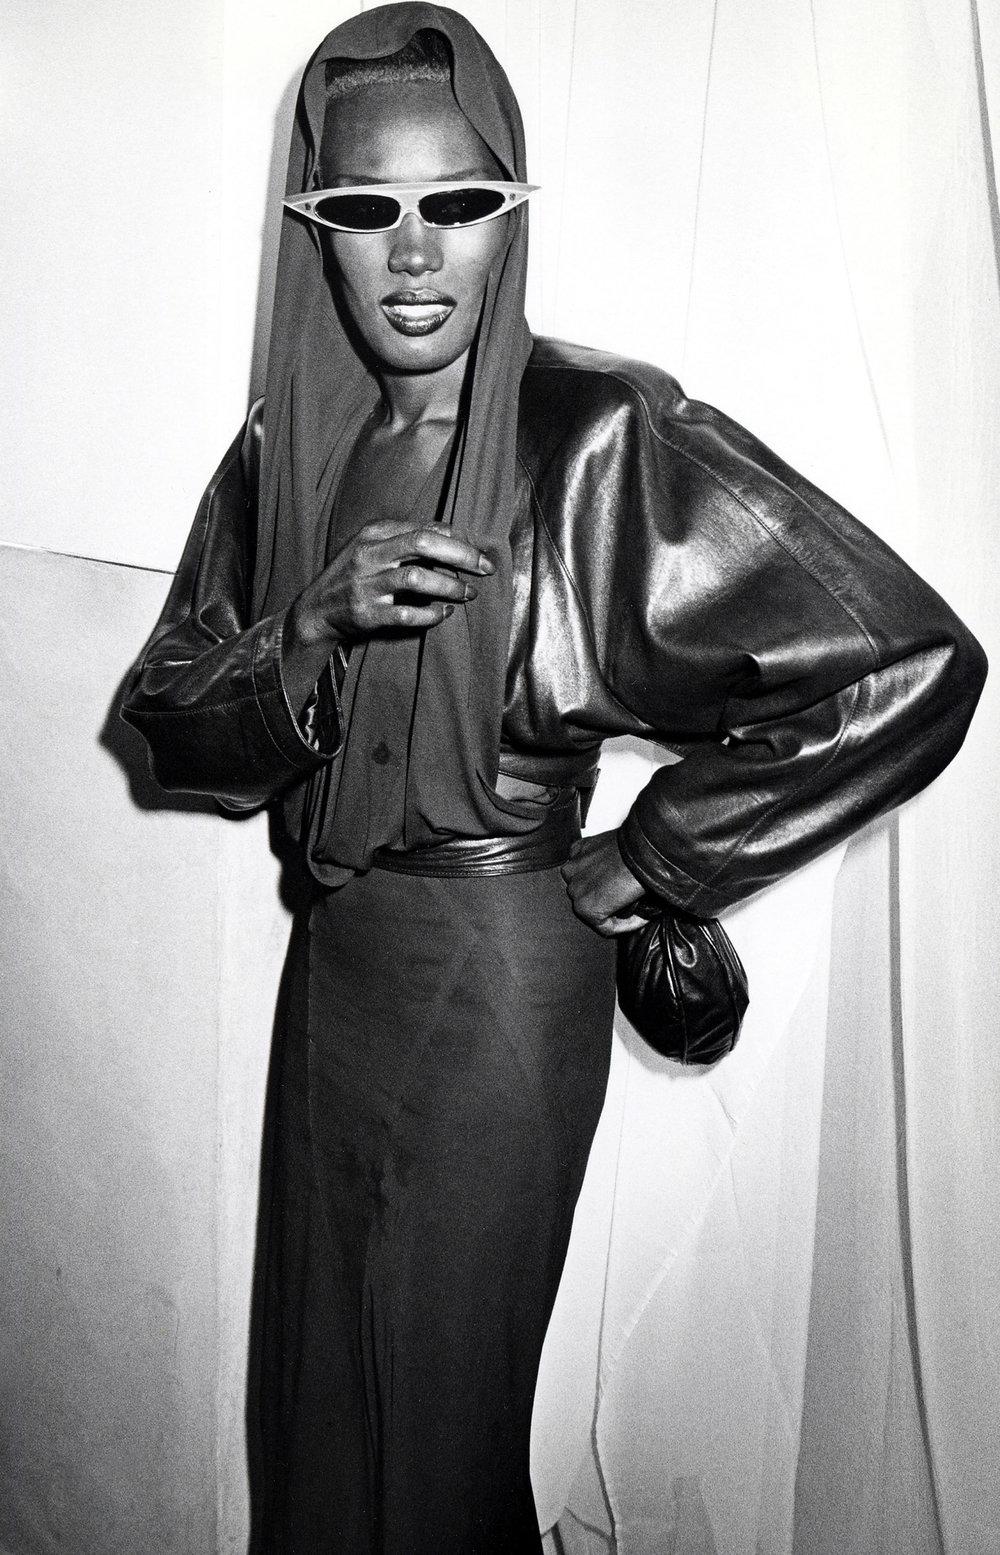 Grace Jones by Ron Galella/WireImage via Getty